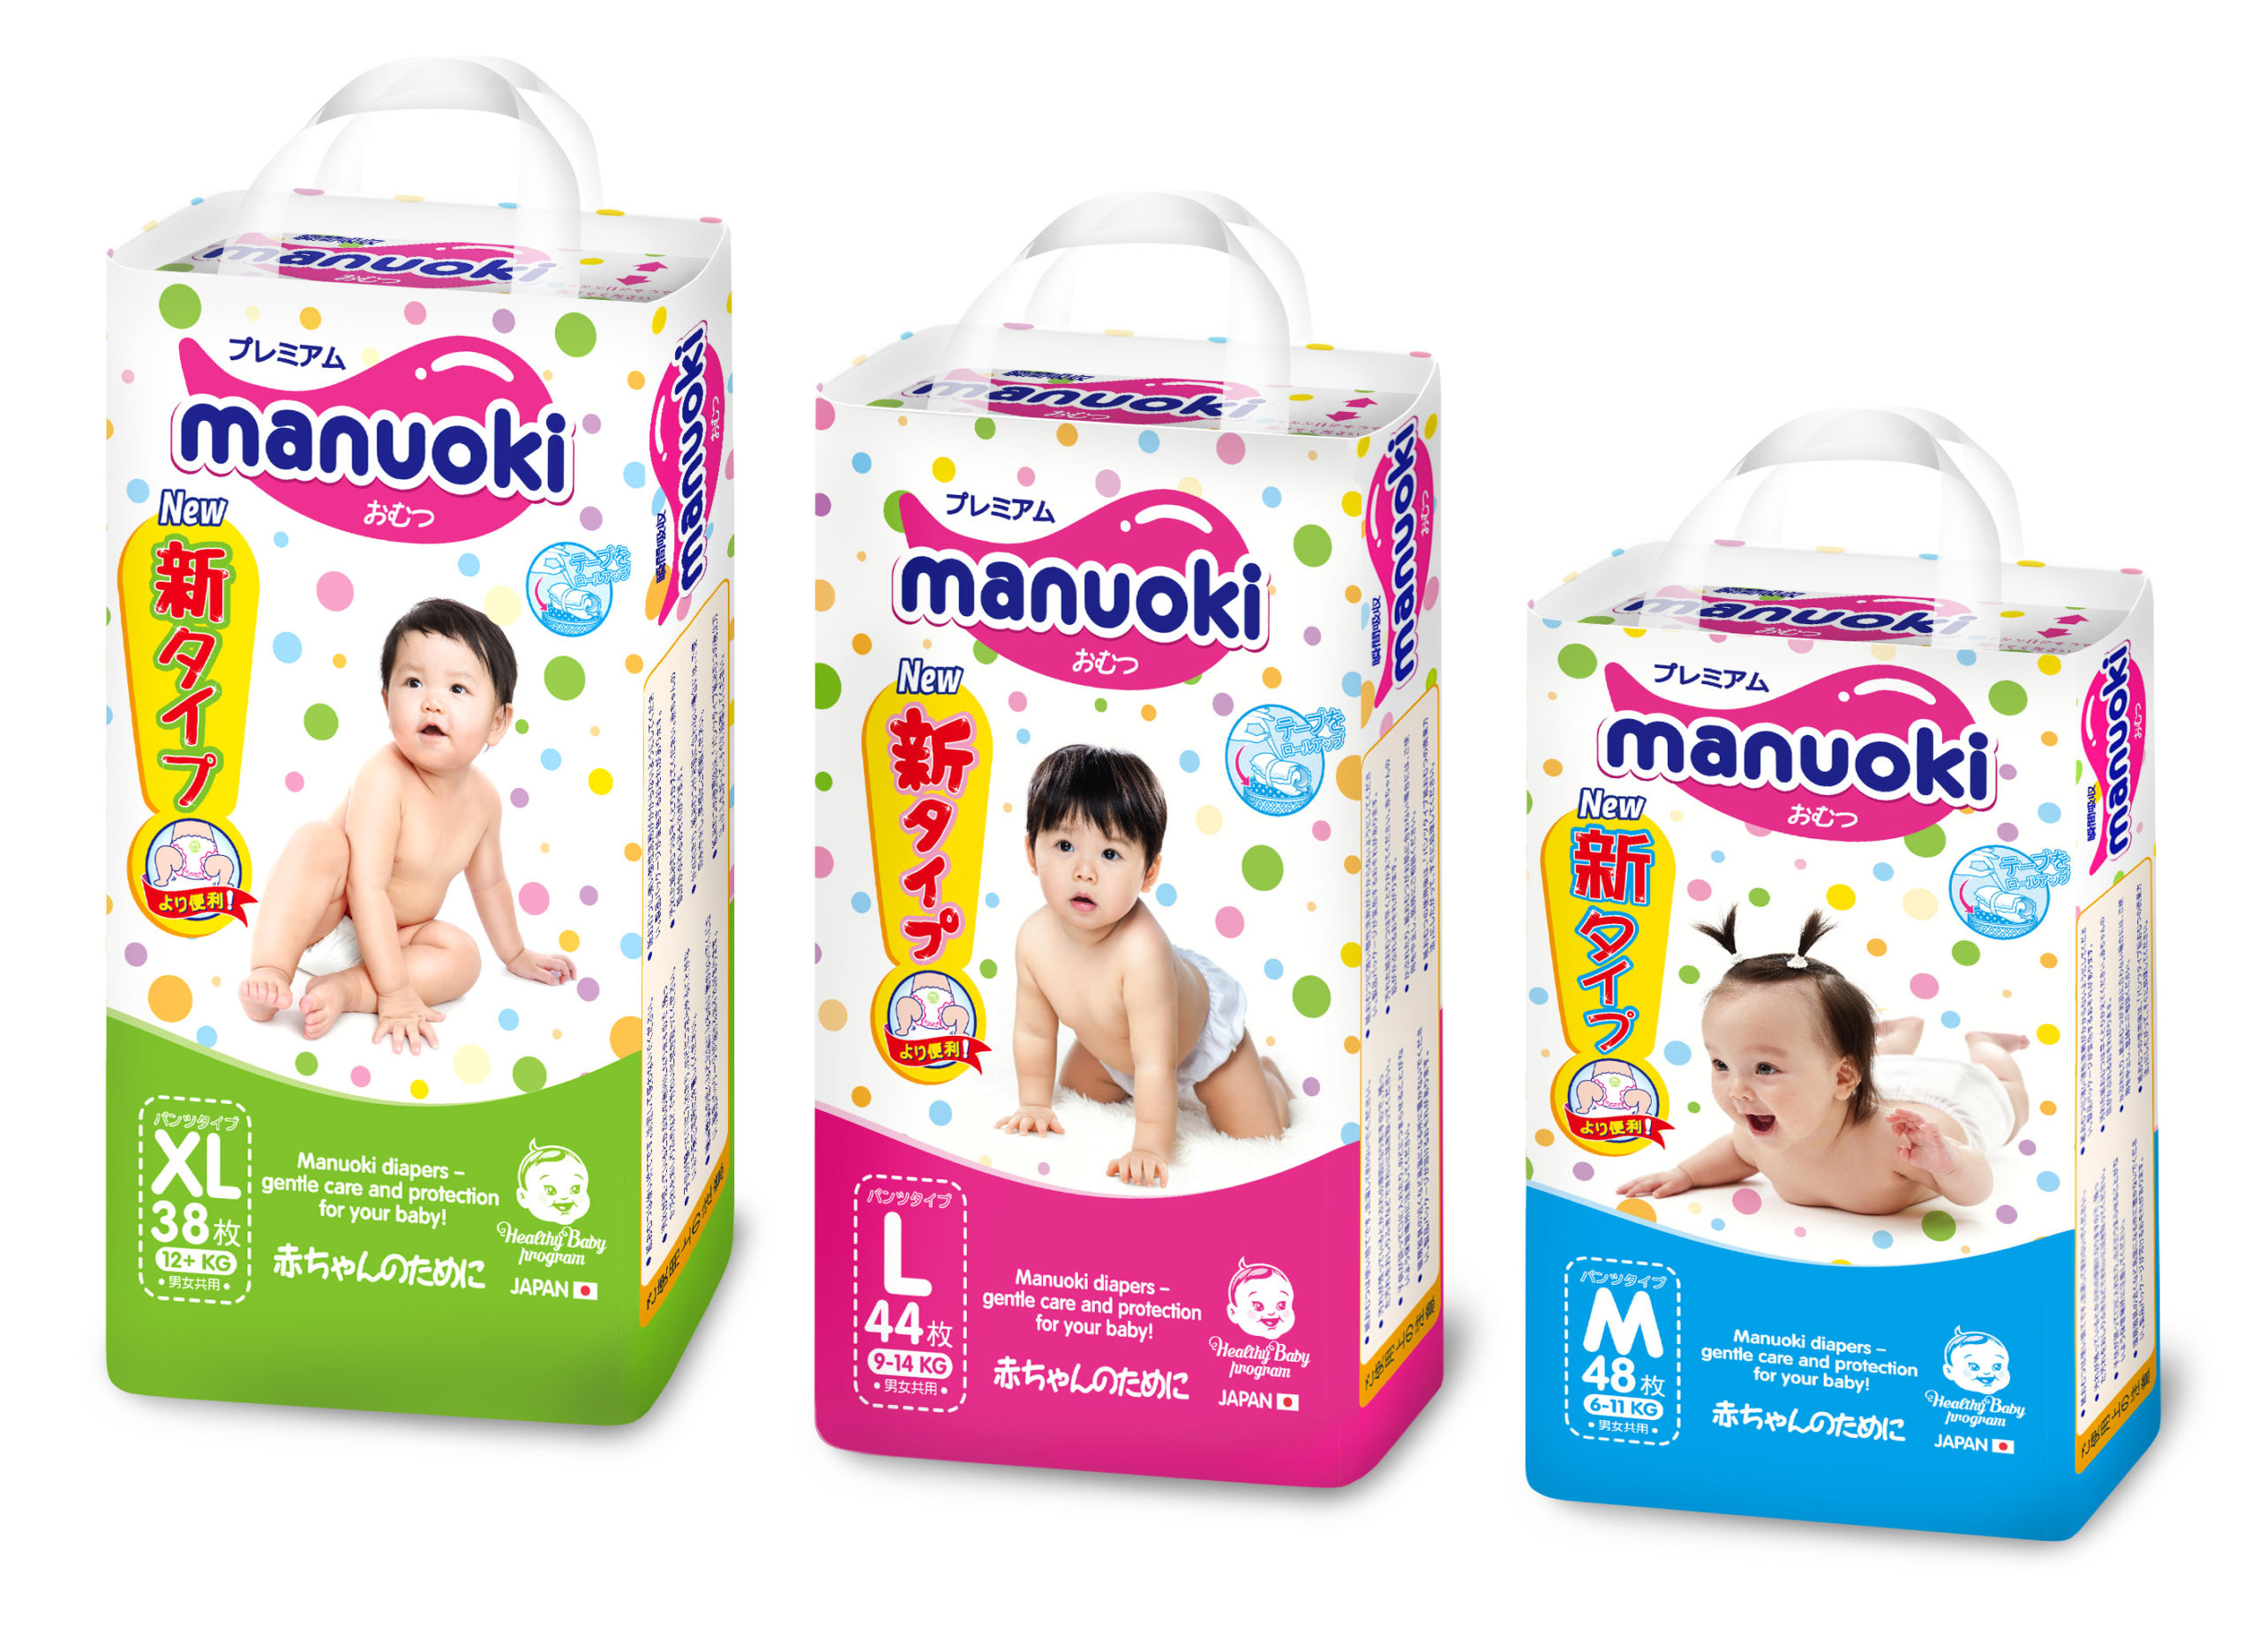 PANTY MANUOKI ALL (1)